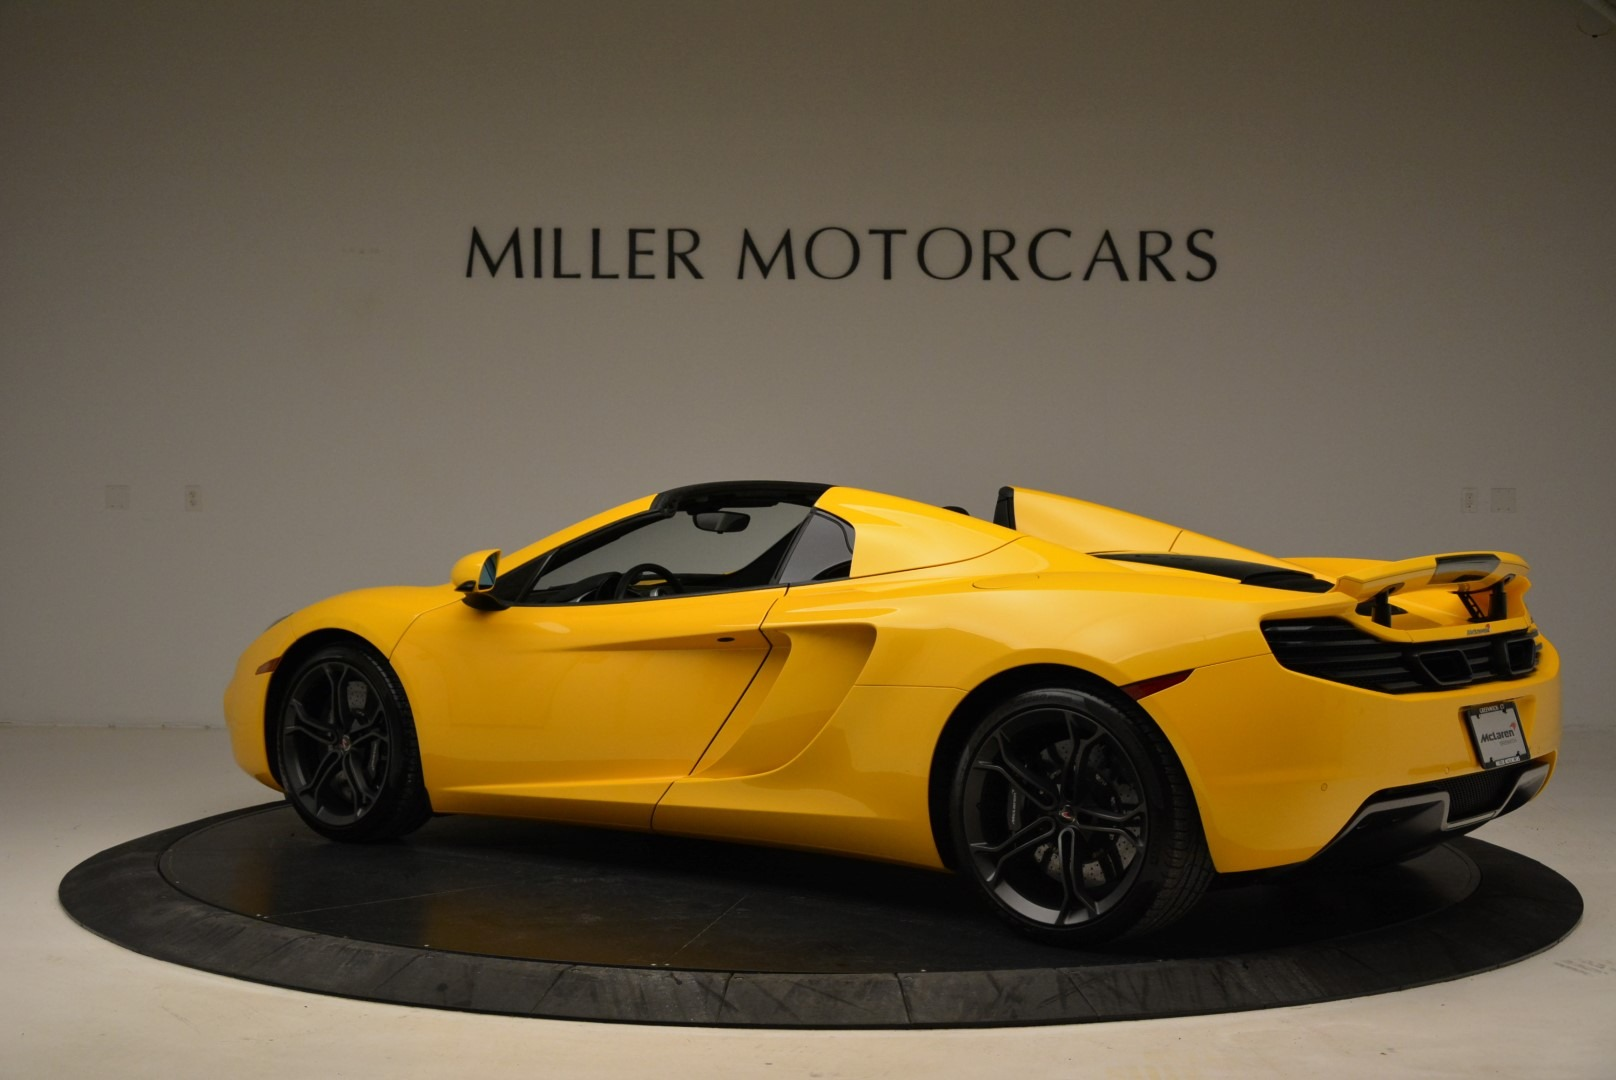 Used 2014 McLaren MP4-12C Spider For Sale In Greenwich, CT. Alfa Romeo of Greenwich, 3134 2057_p4